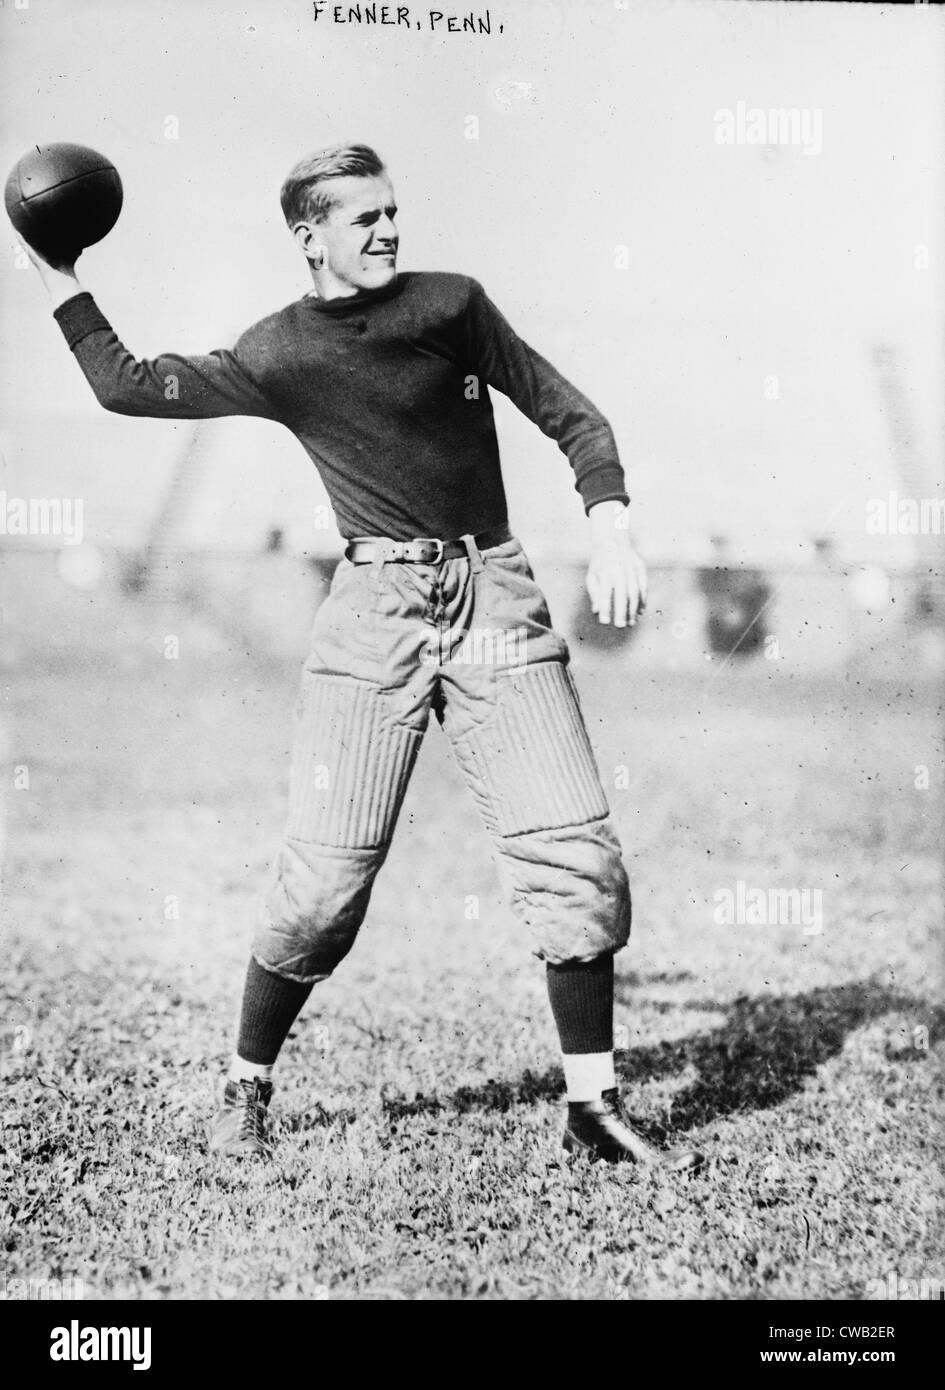 Calcio, Fenner, University of Pennsylvania, circa 1910-1915. Immagini Stock